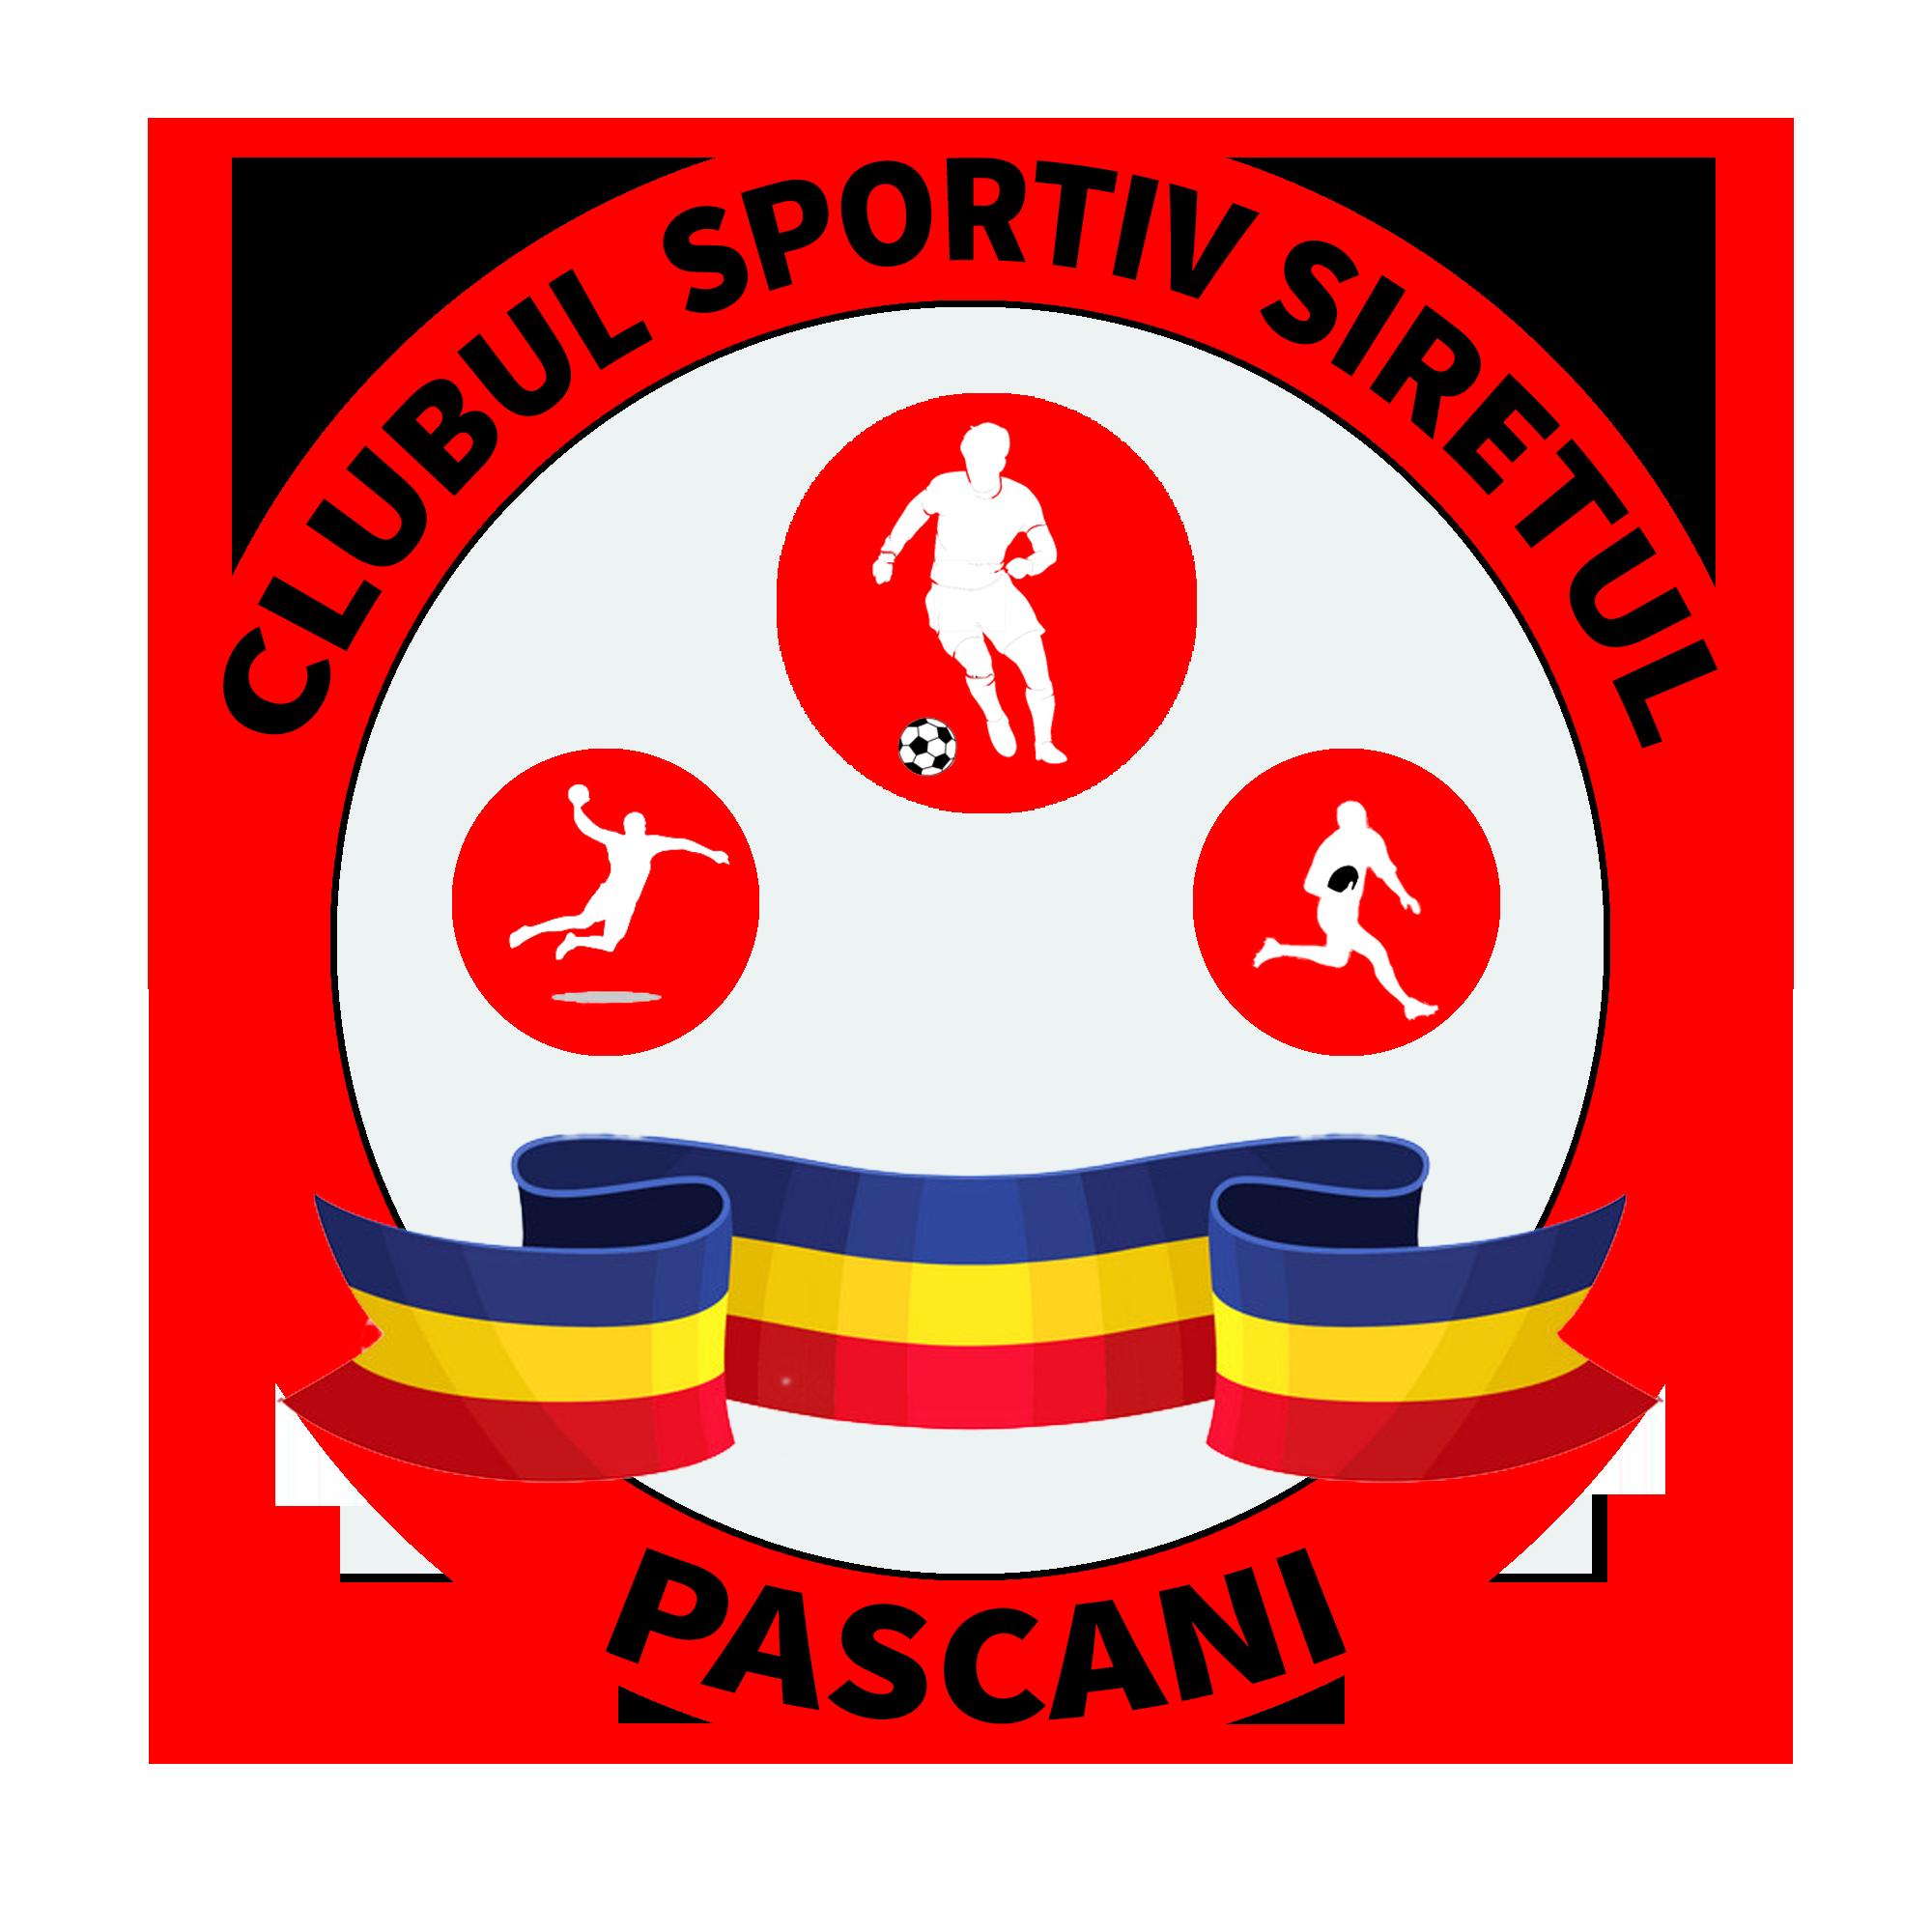 ACS SIRETUL PASCANI logo